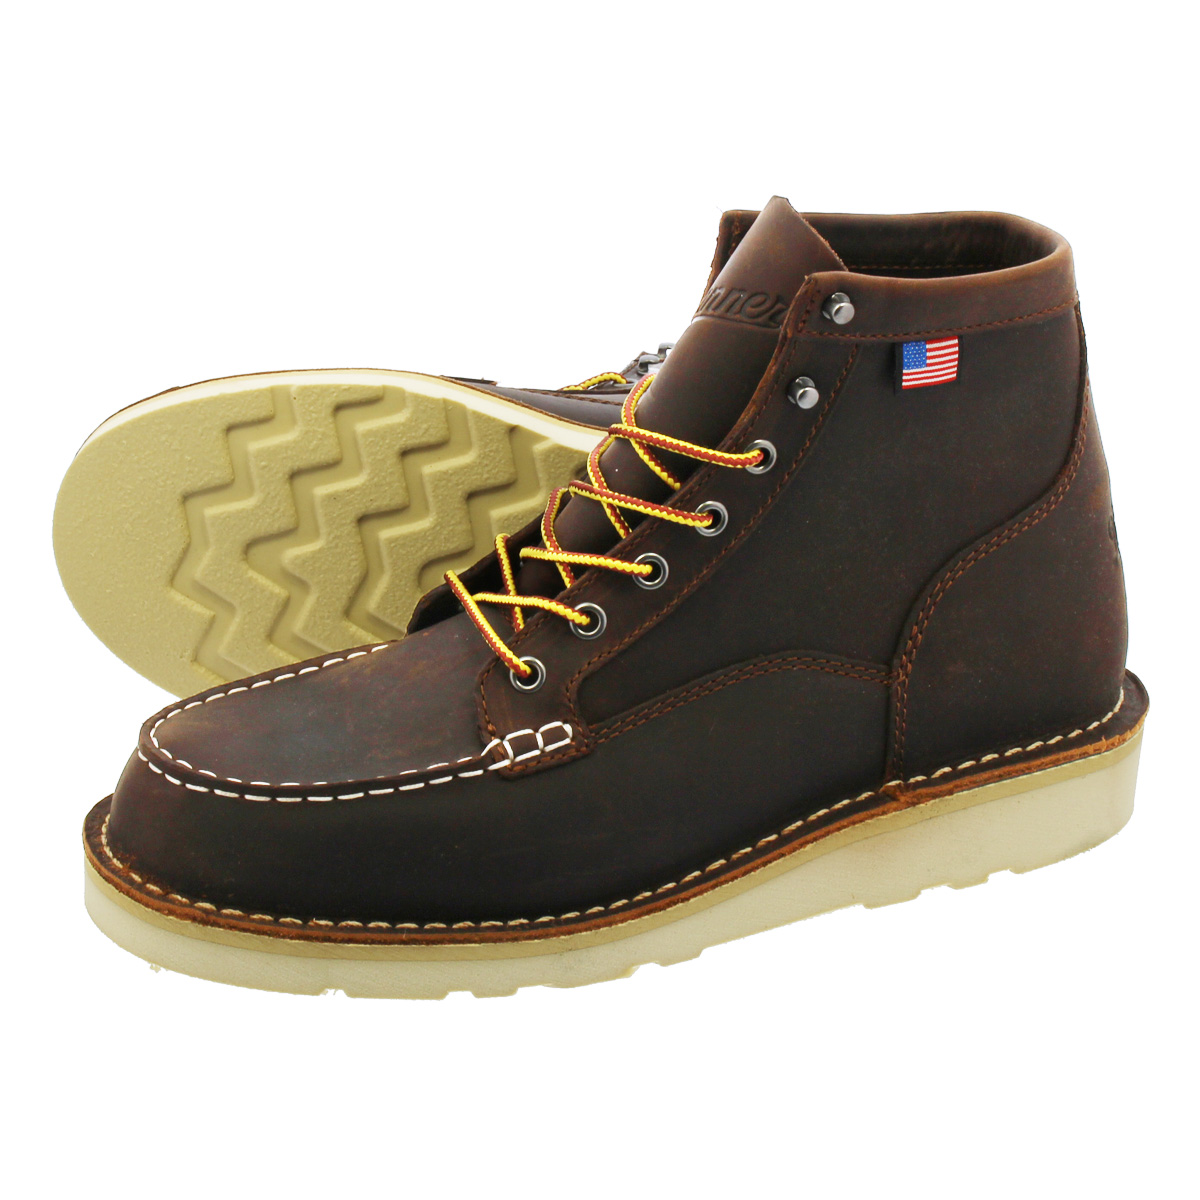 DANNER BULL RUN MOC TOE 6INCH BOOT 【MADE IN U.S.A.】【D WIDTH】ダナー ブル ラン モック トゥ 6インチ ブーツ BROWN 15563